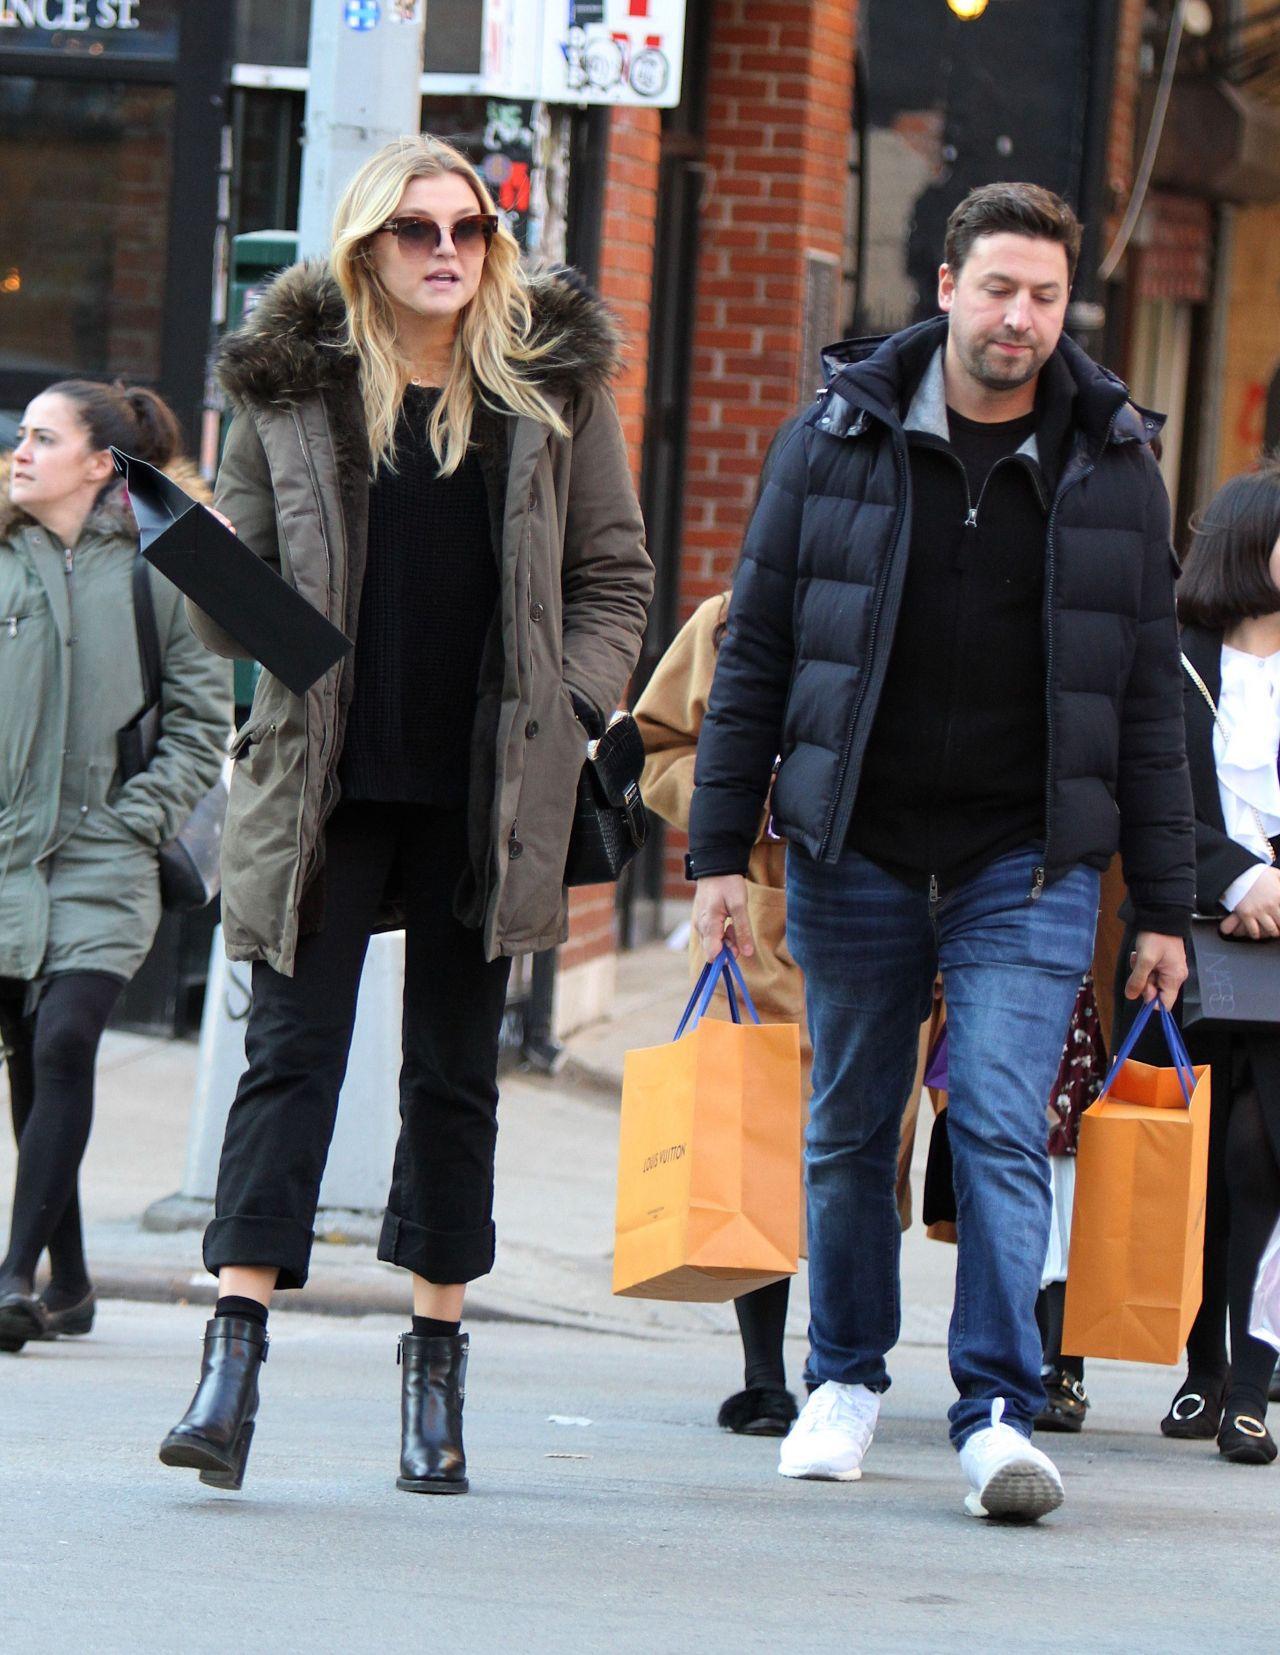 Rachel hilbert out shopping in new york - 2019 year